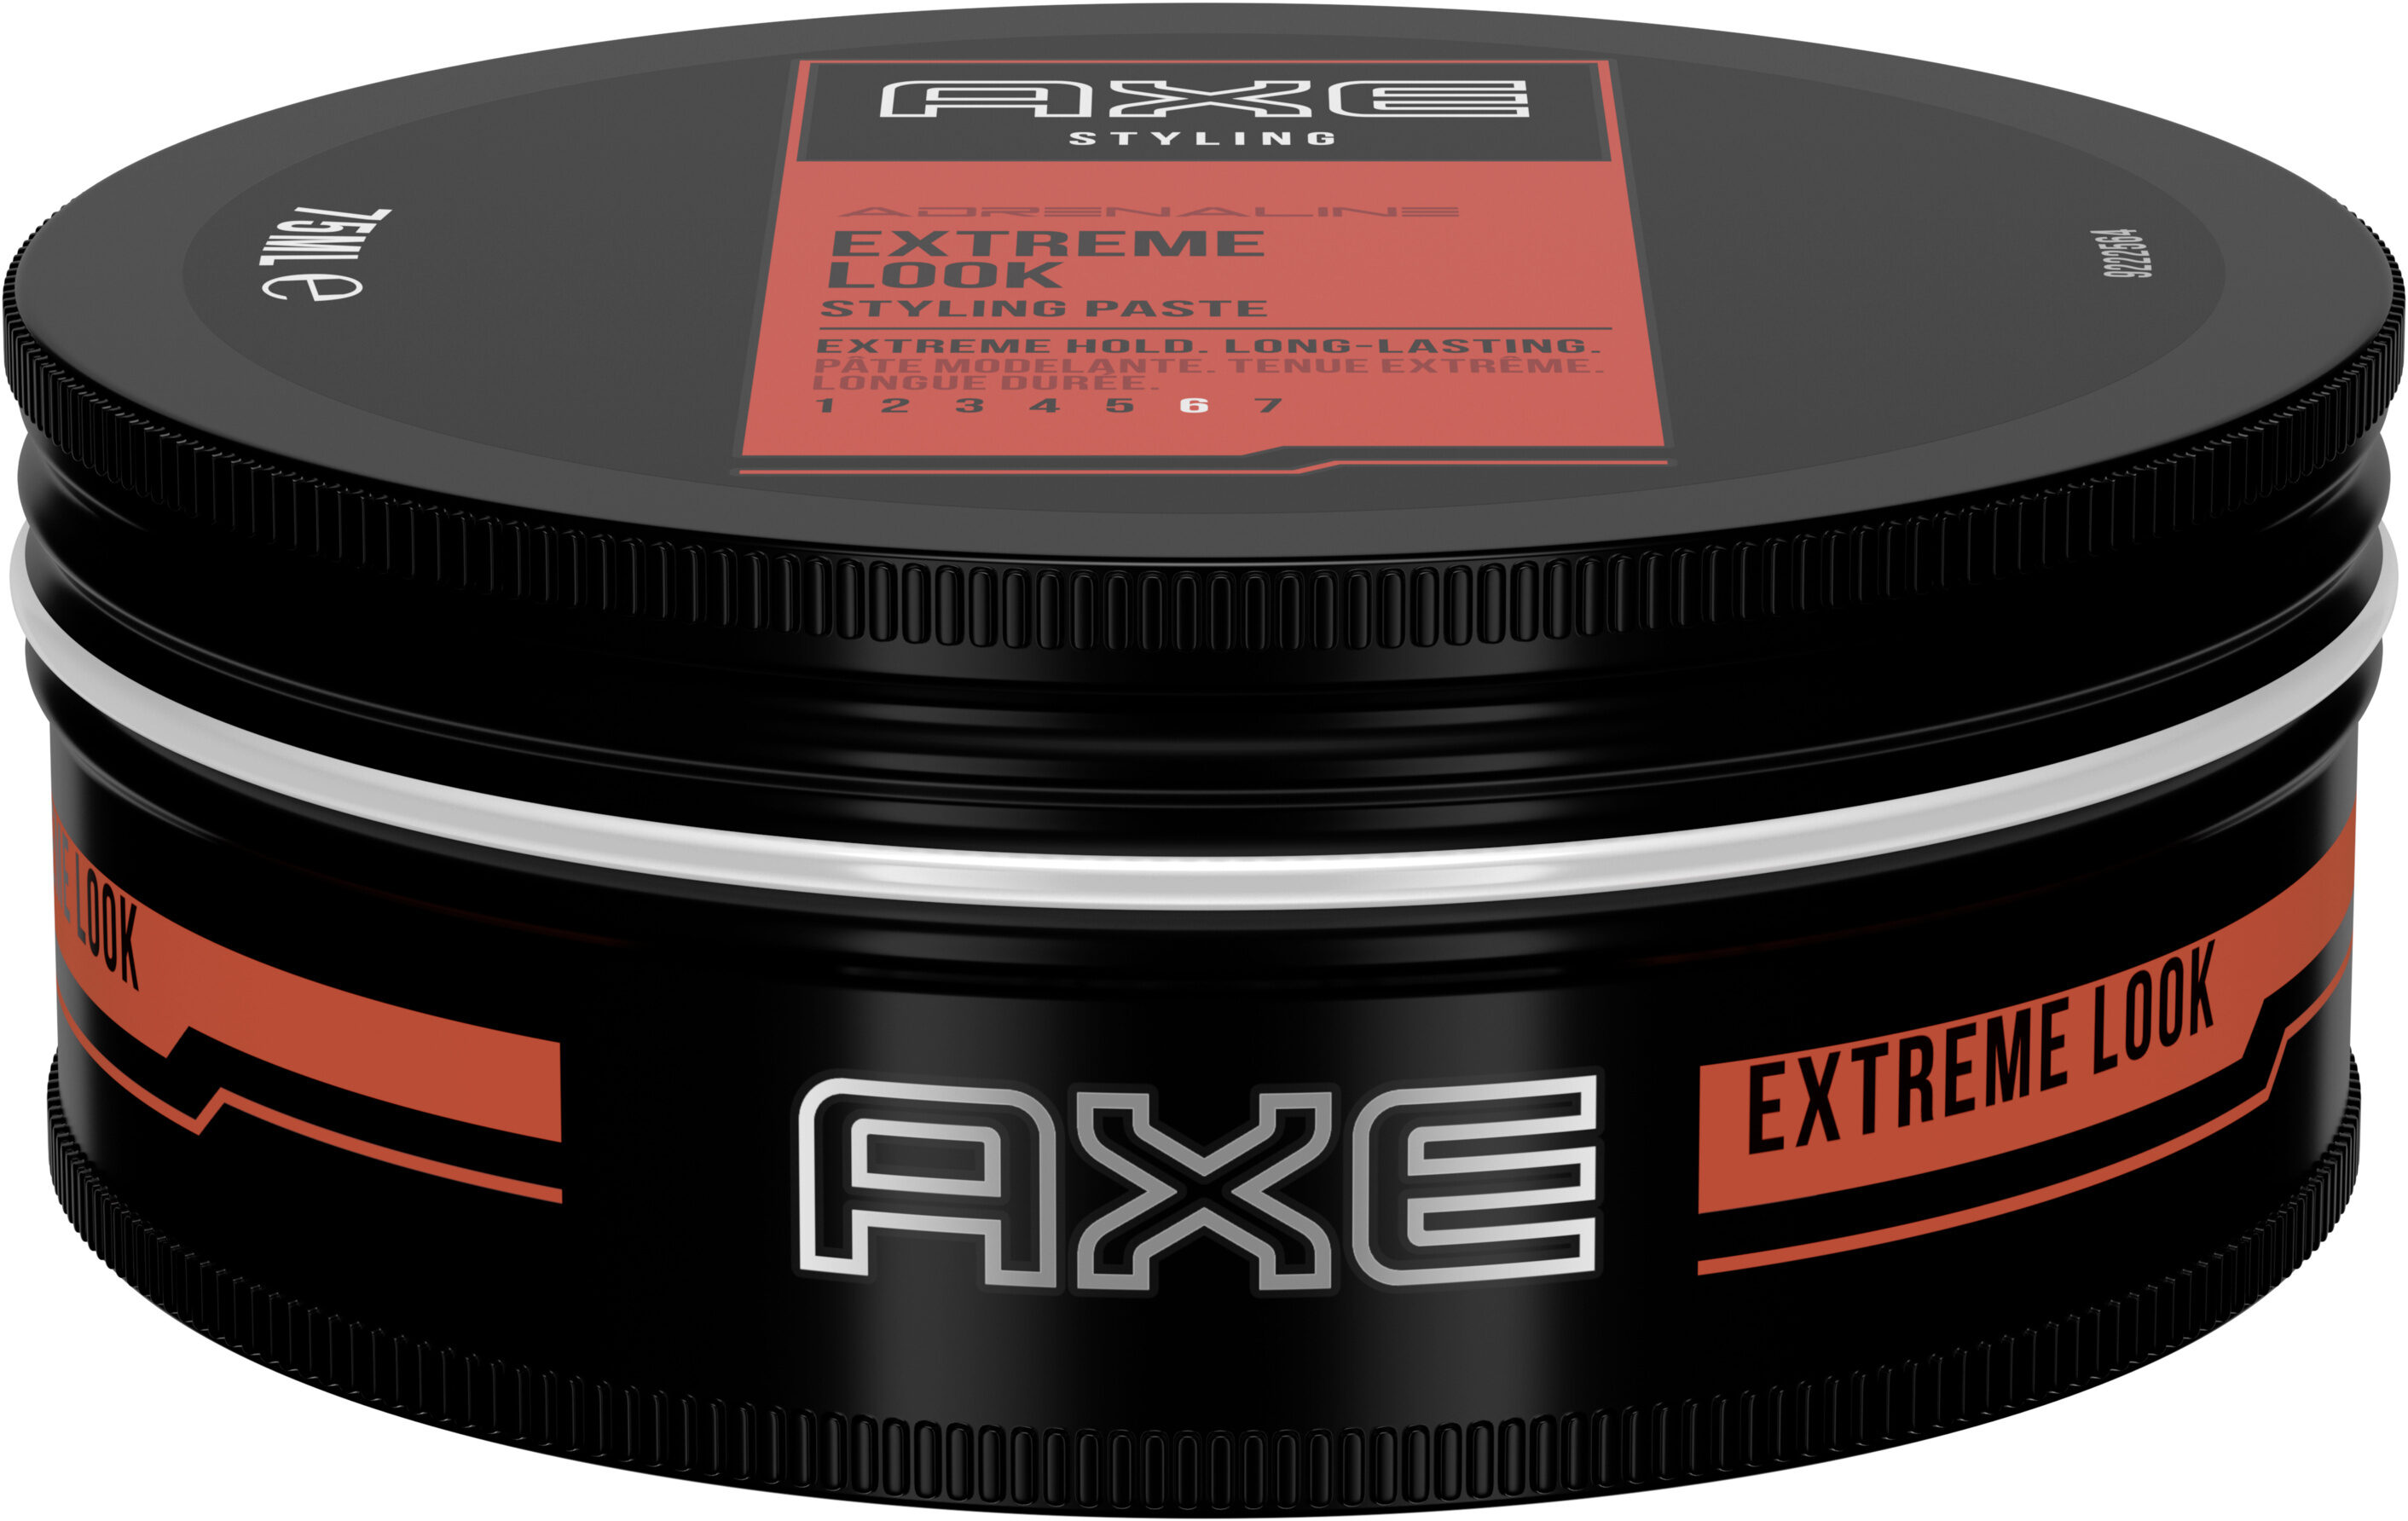 AXE GEL CHEVEUX Extrême Look Pot - Product - fr